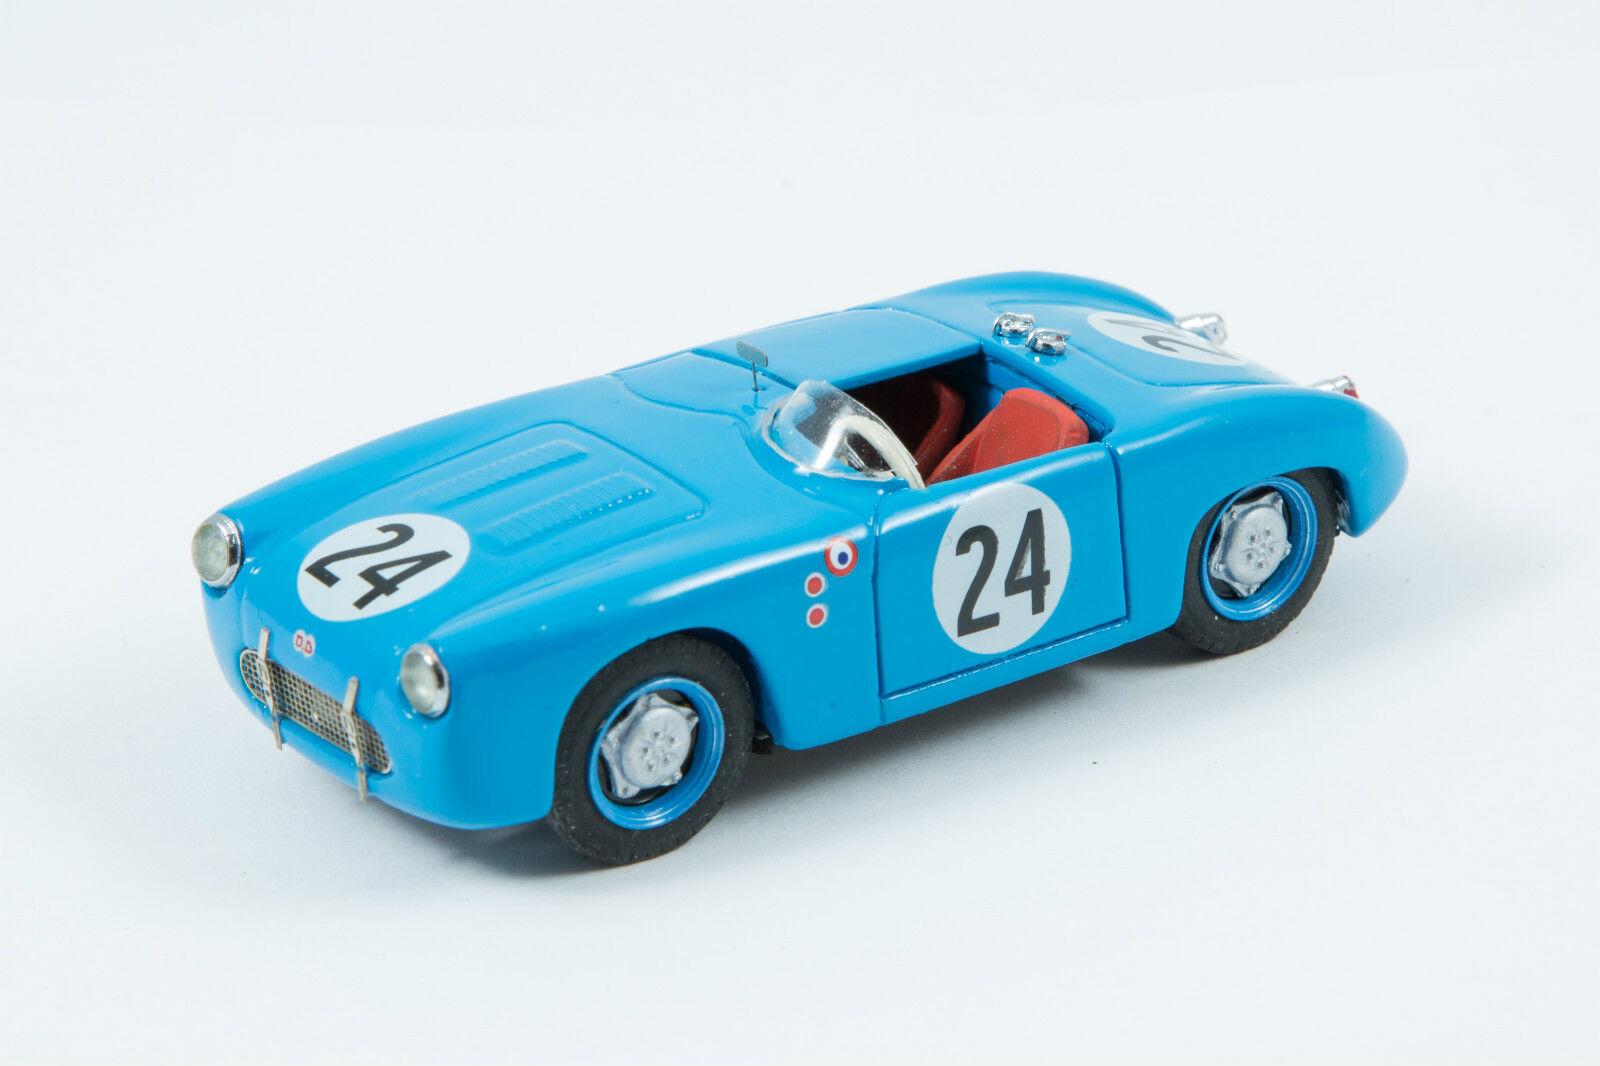 Miniature car CCC mounted db panhard left sebring 1952 number 24